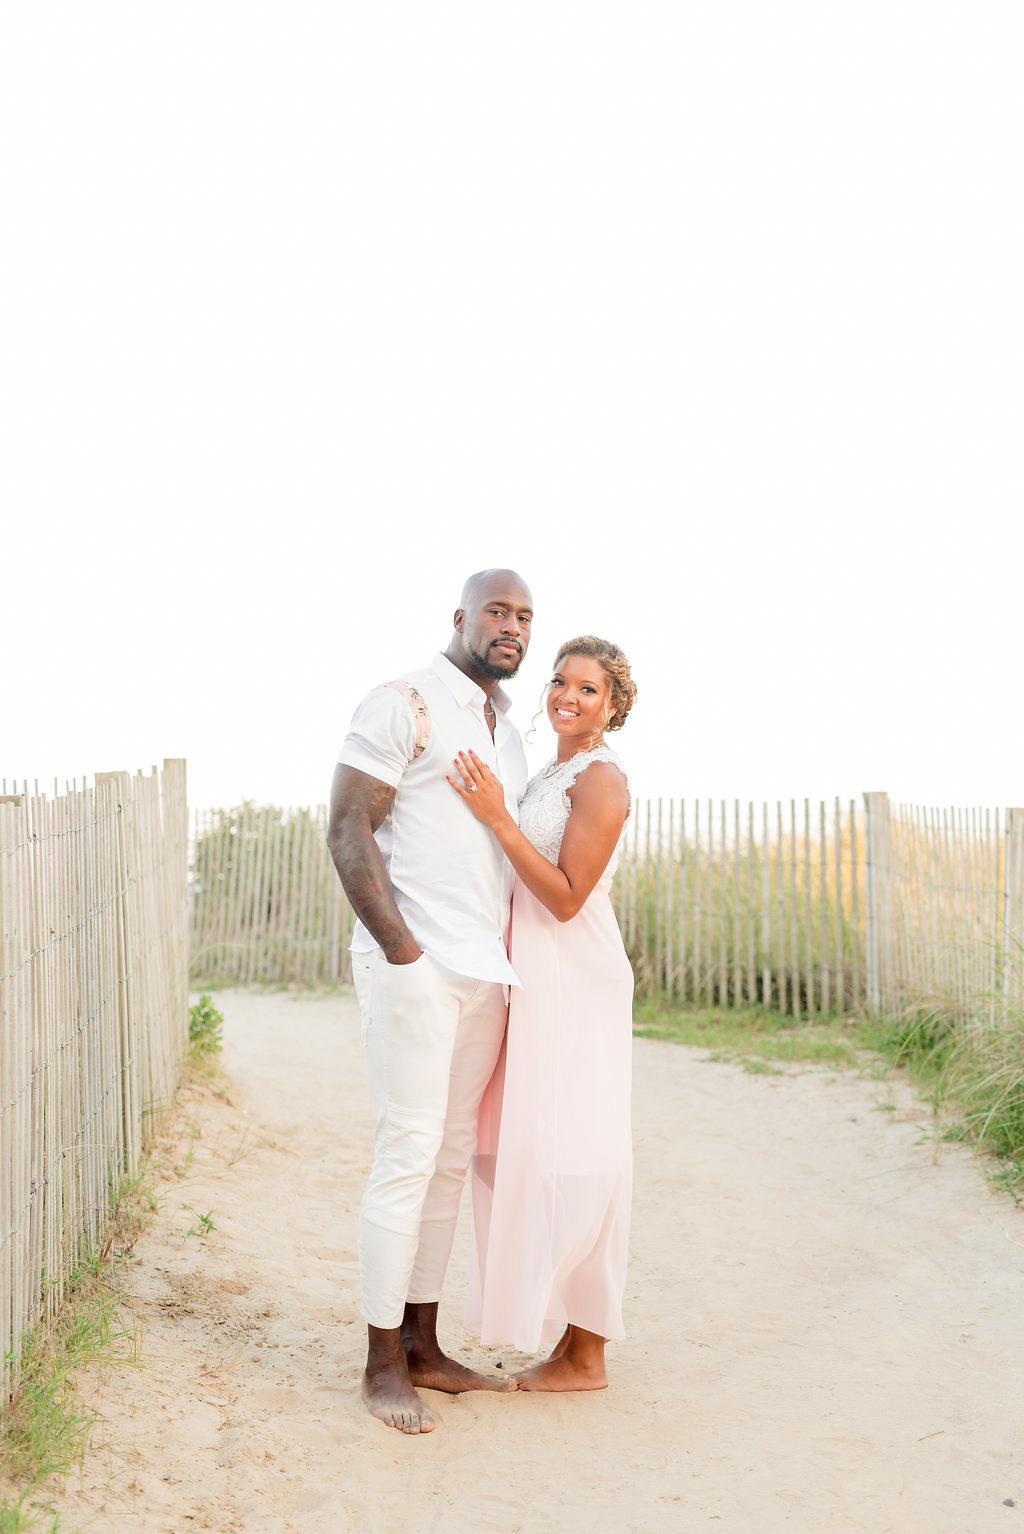 couple posing on sand path